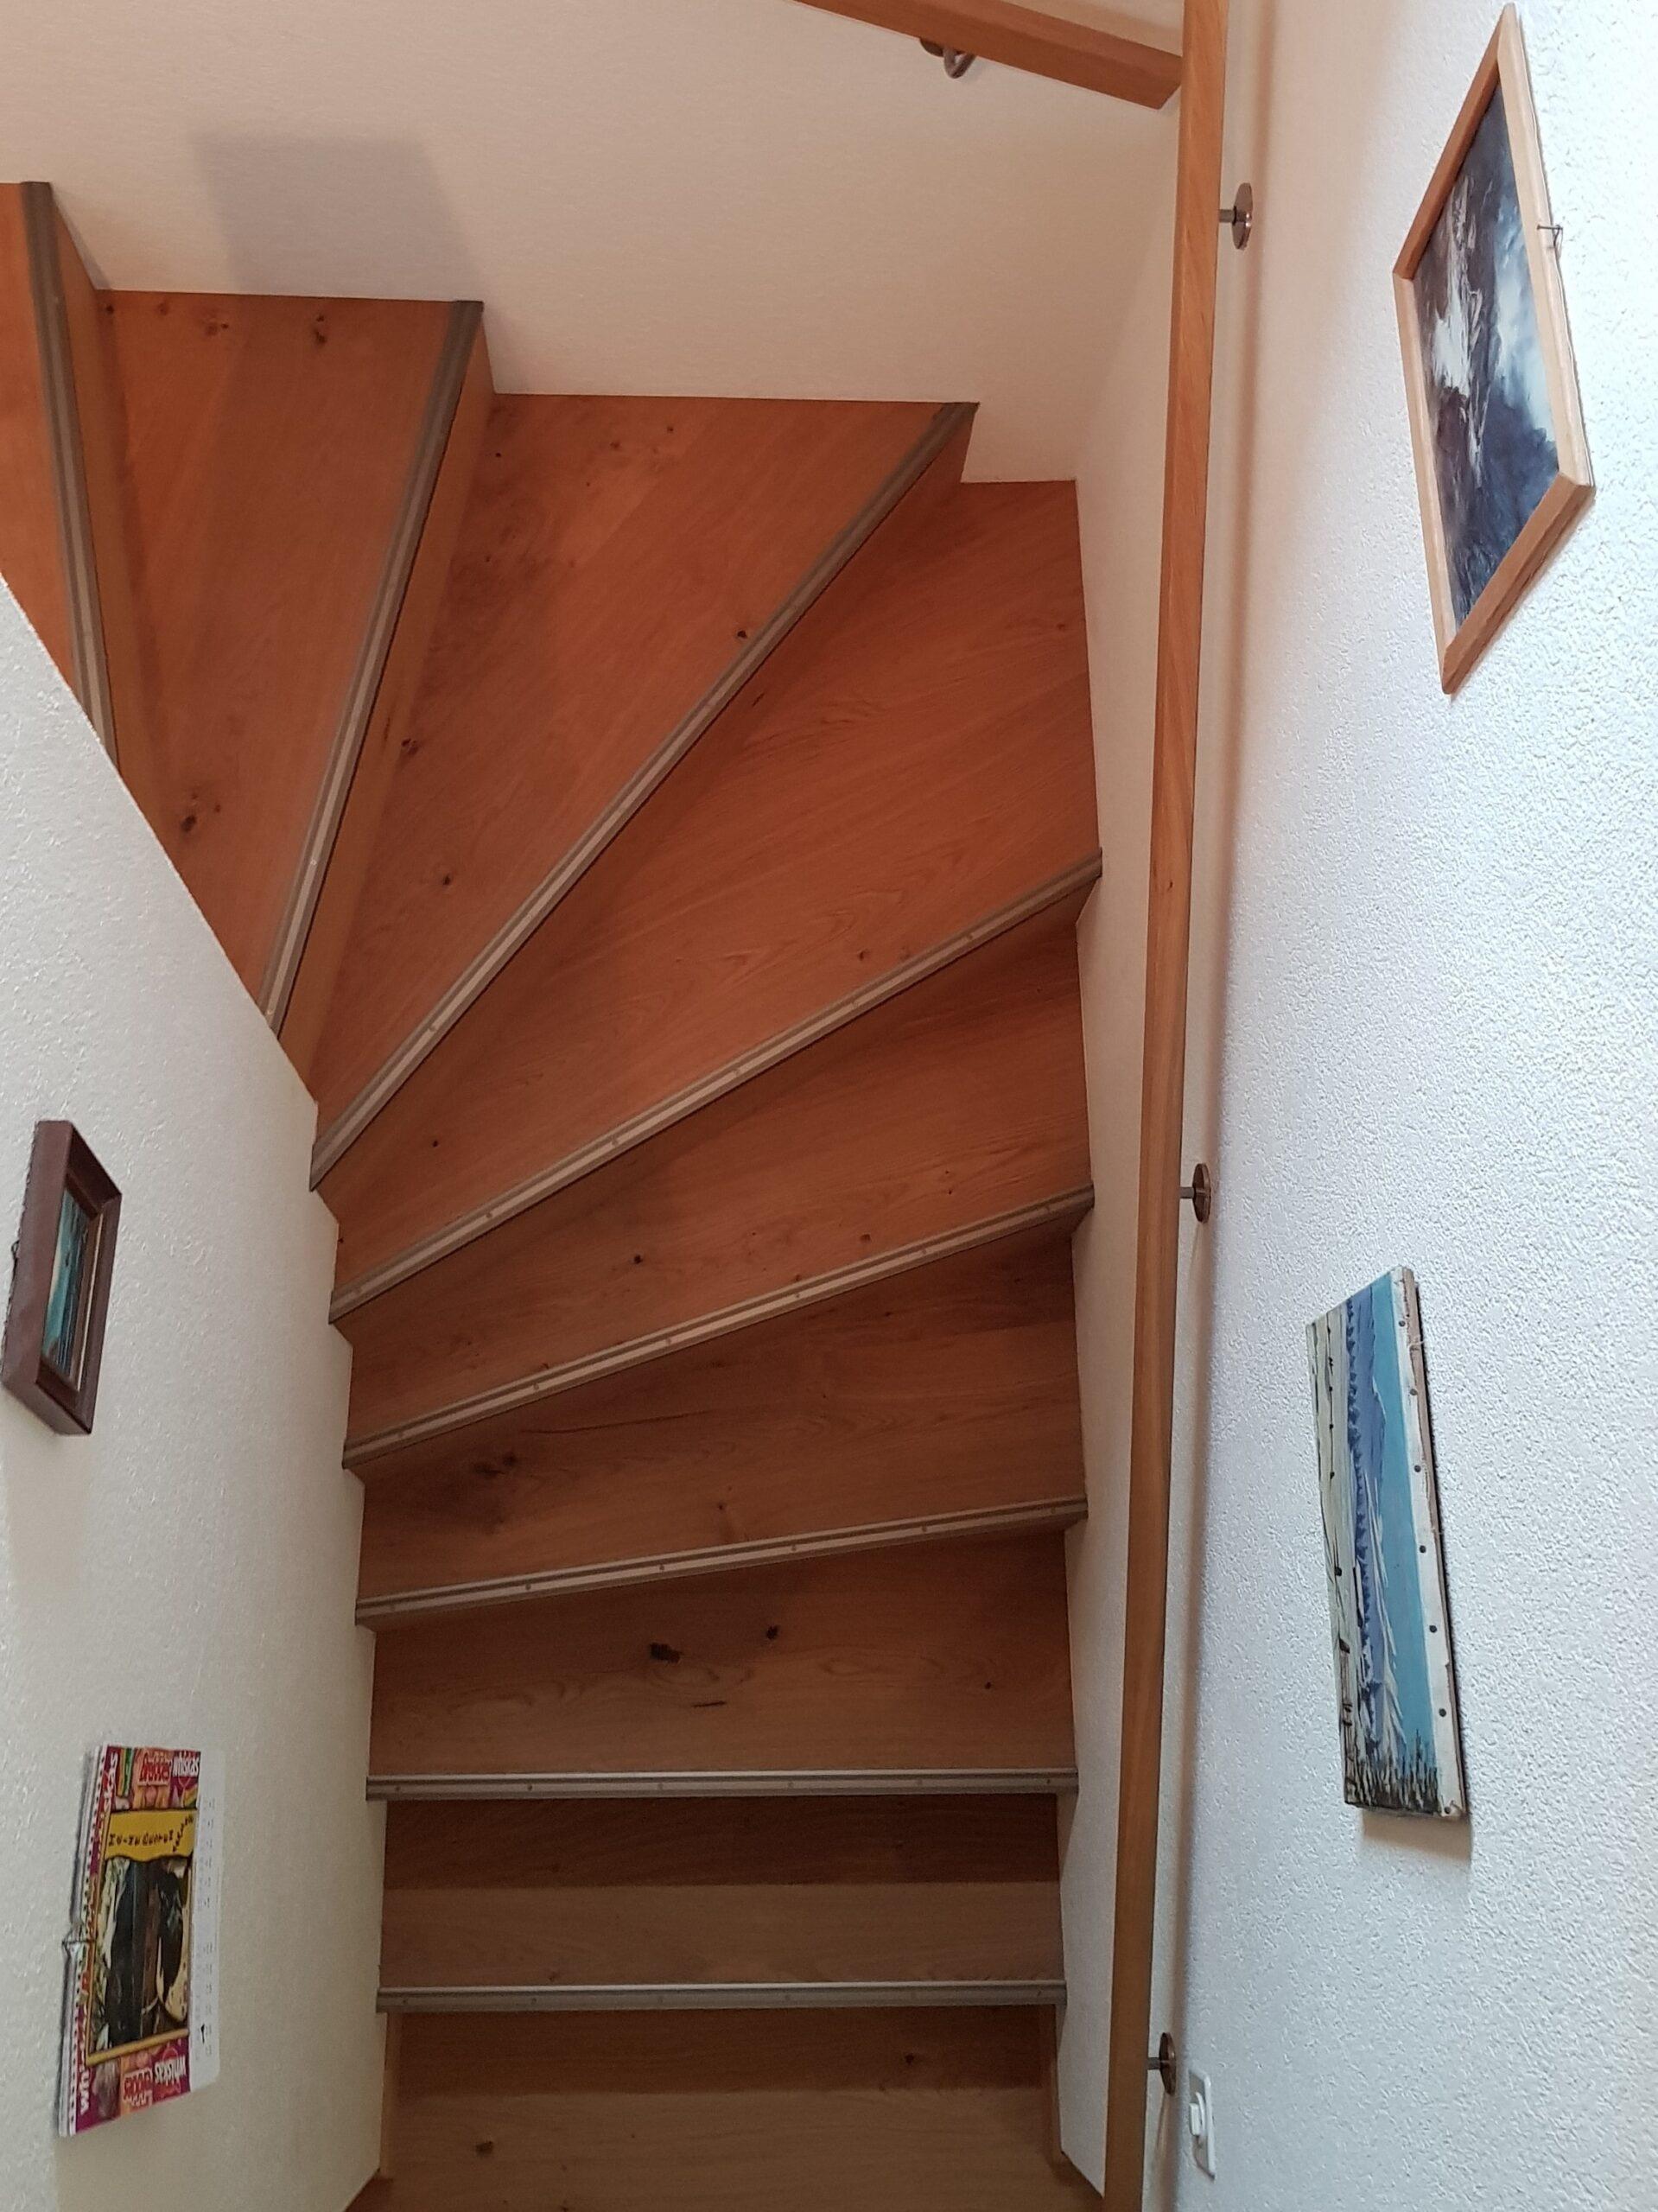 Wooddesign_Treppen_Teppengeländer_Holztreppen_Treppenverkleidung_Handlauf_Parkettverkleidung_Treppenprofil (7)-min